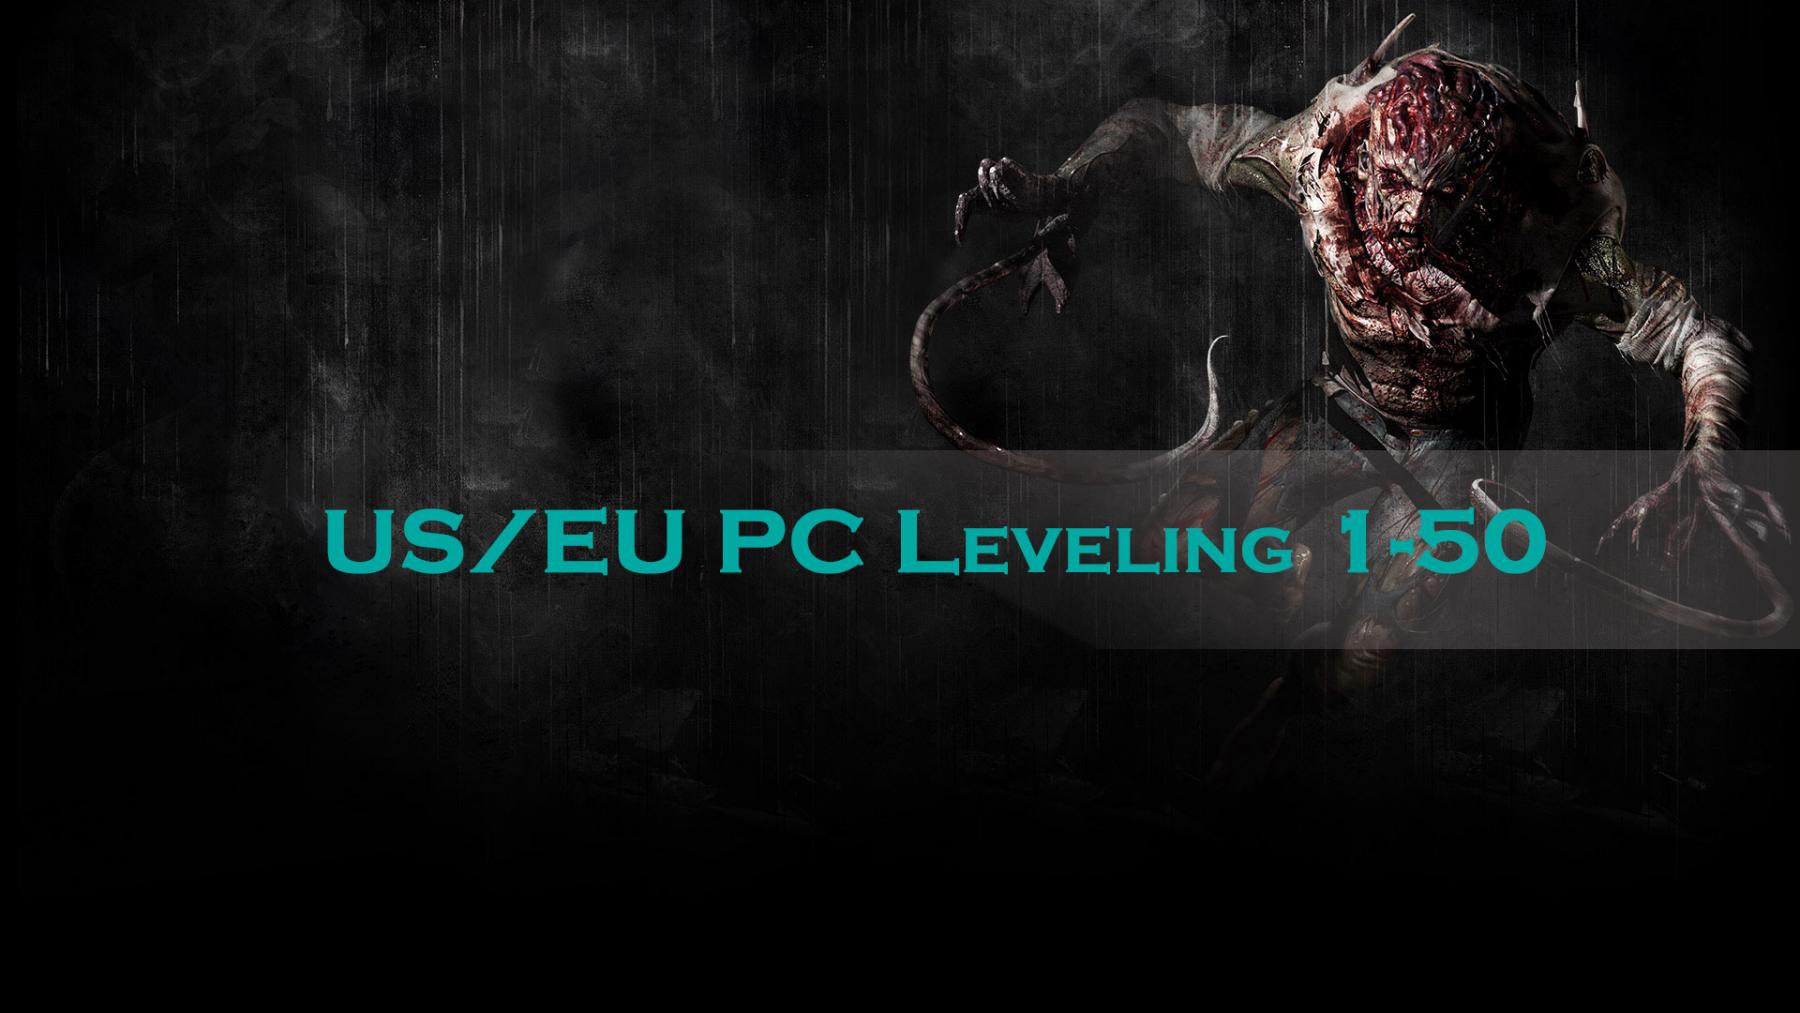 US/EU PC Leveling 1-50